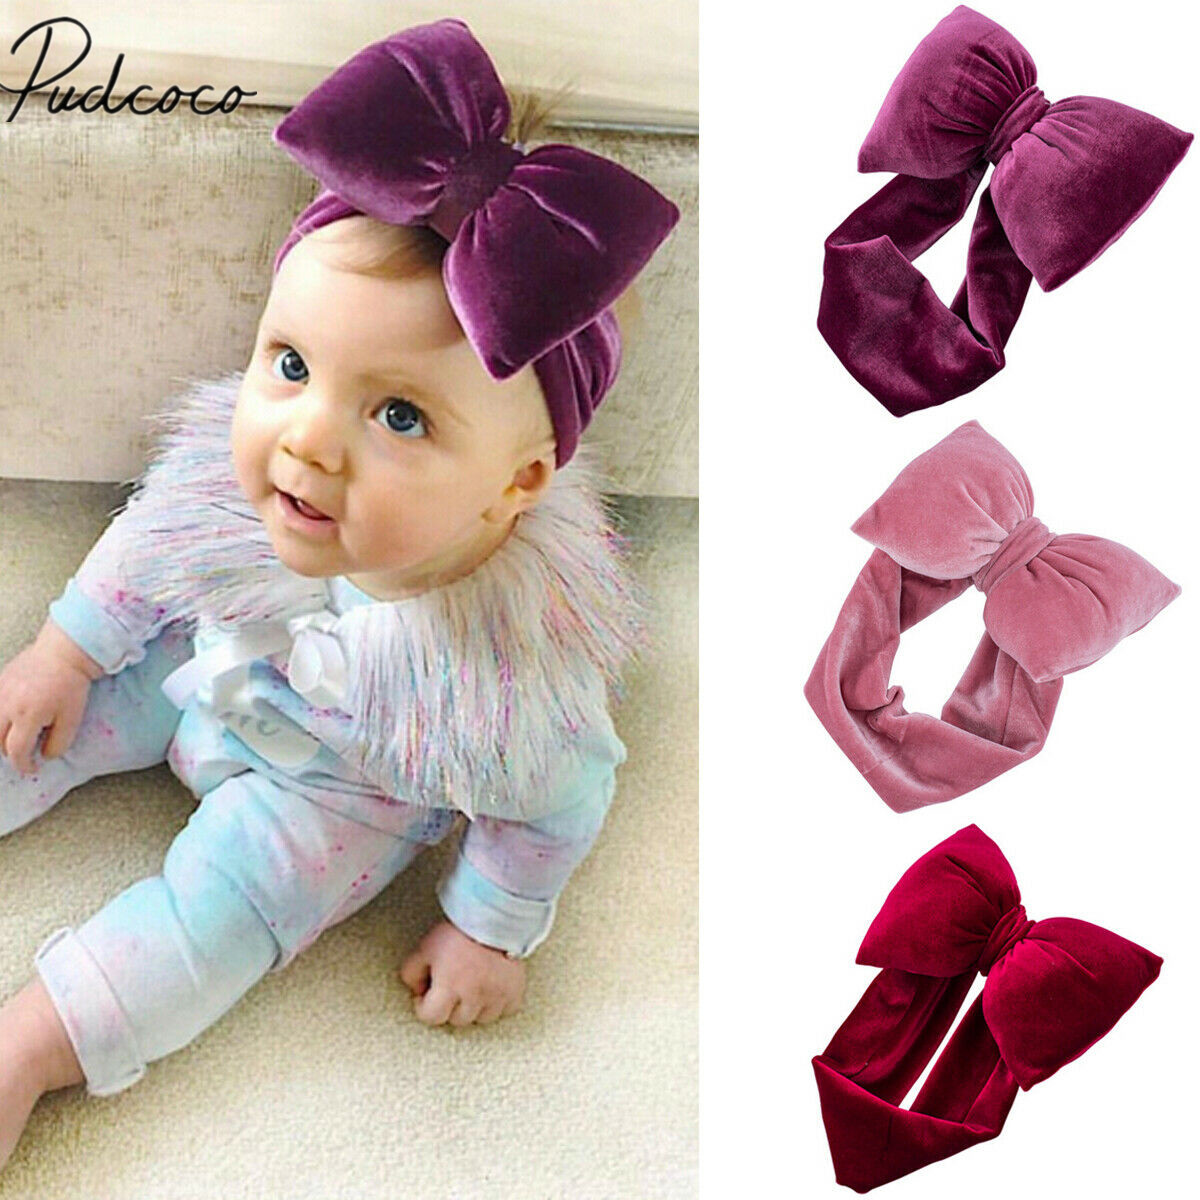 Kids Girl Baby Toddler Big Bow Headband Hair Band Accessories Headwear Head Wrap